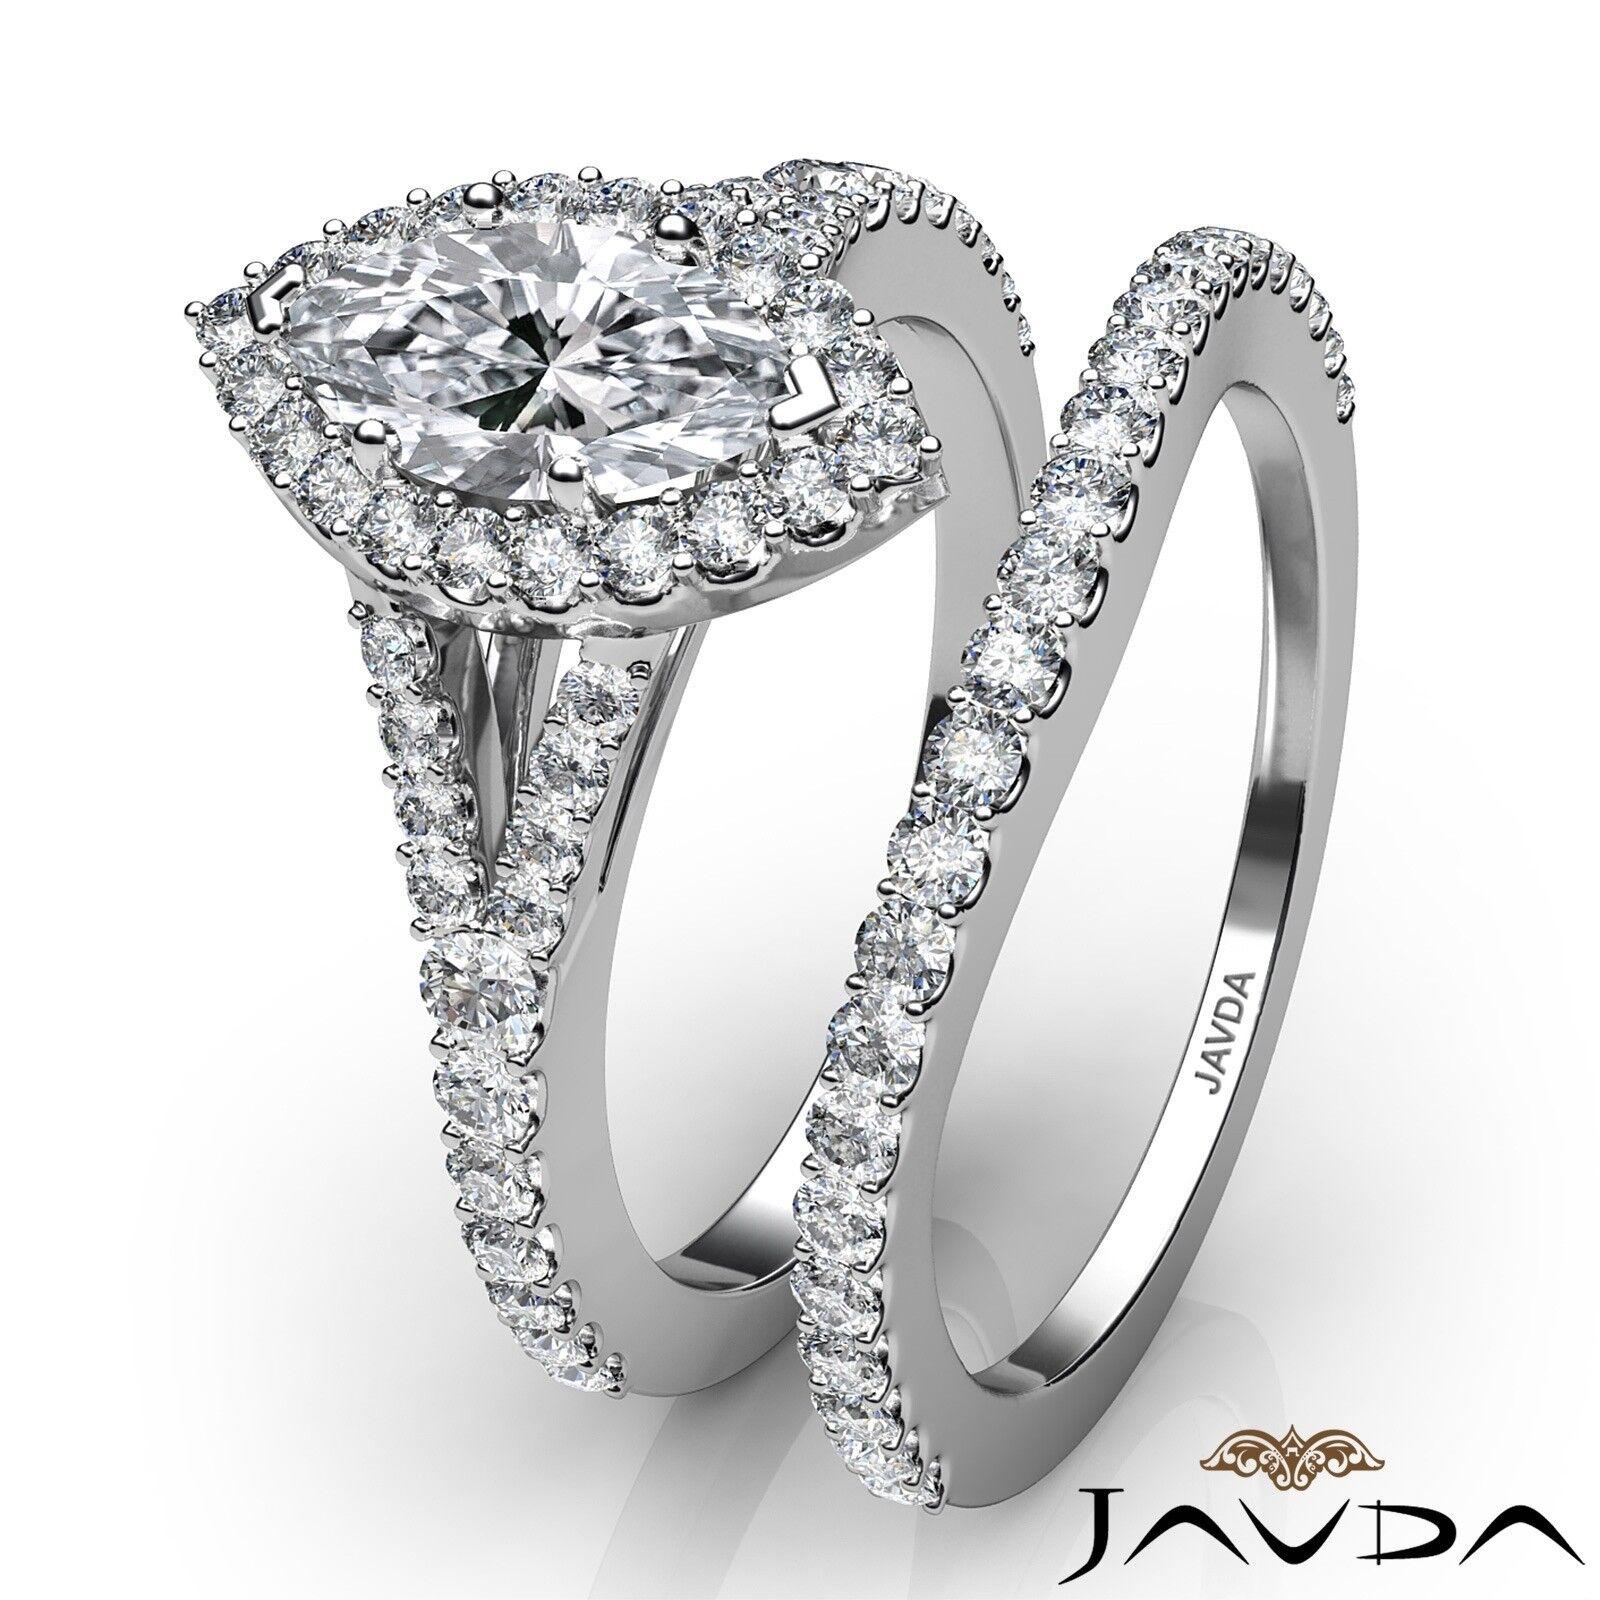 2.02ctw Halo Bridal Set Split Shank Marquise Diamond Engagement Ring GIA F-SI1 3